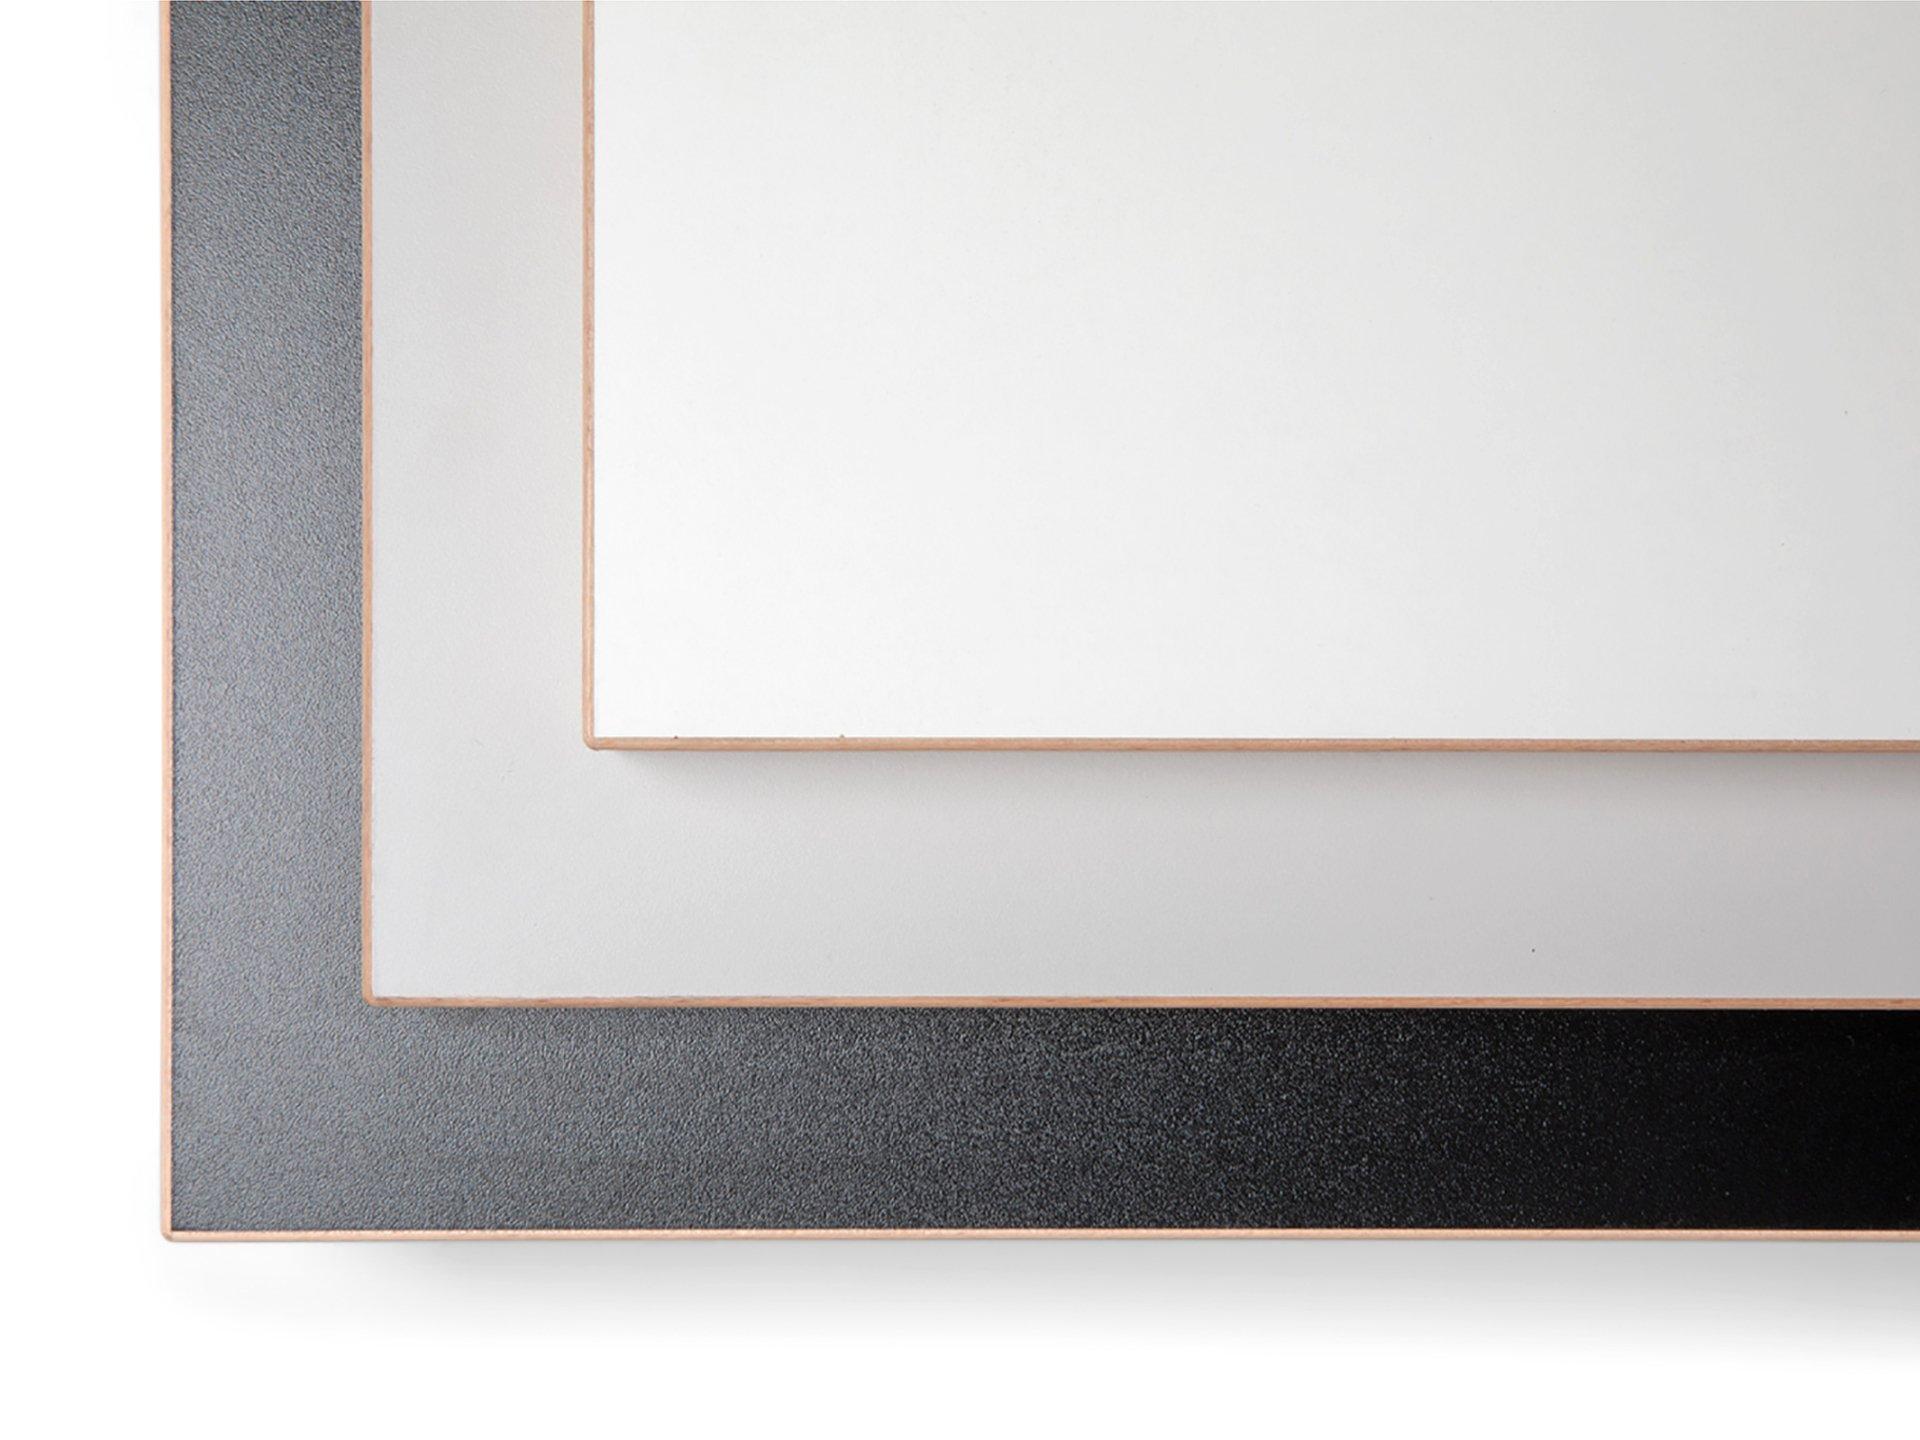 Tischplatte  Melamin Tischplatte günstig bestellen | Modulor